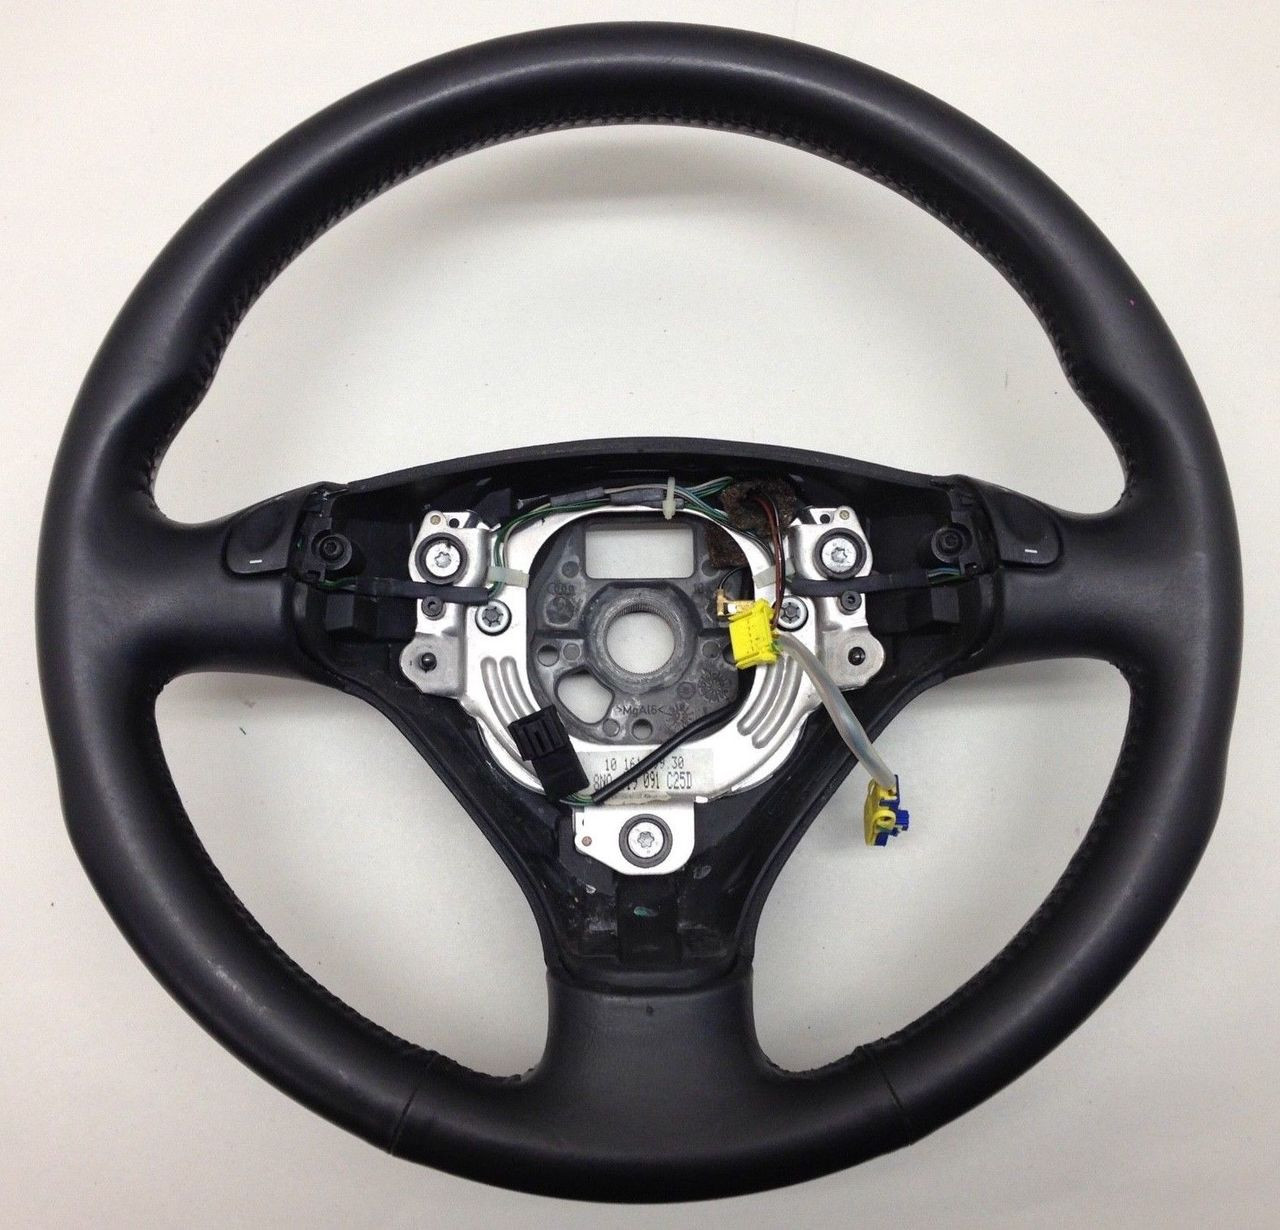 2000 2006 Audi Tt Steering Wheel Fits Tiptronic